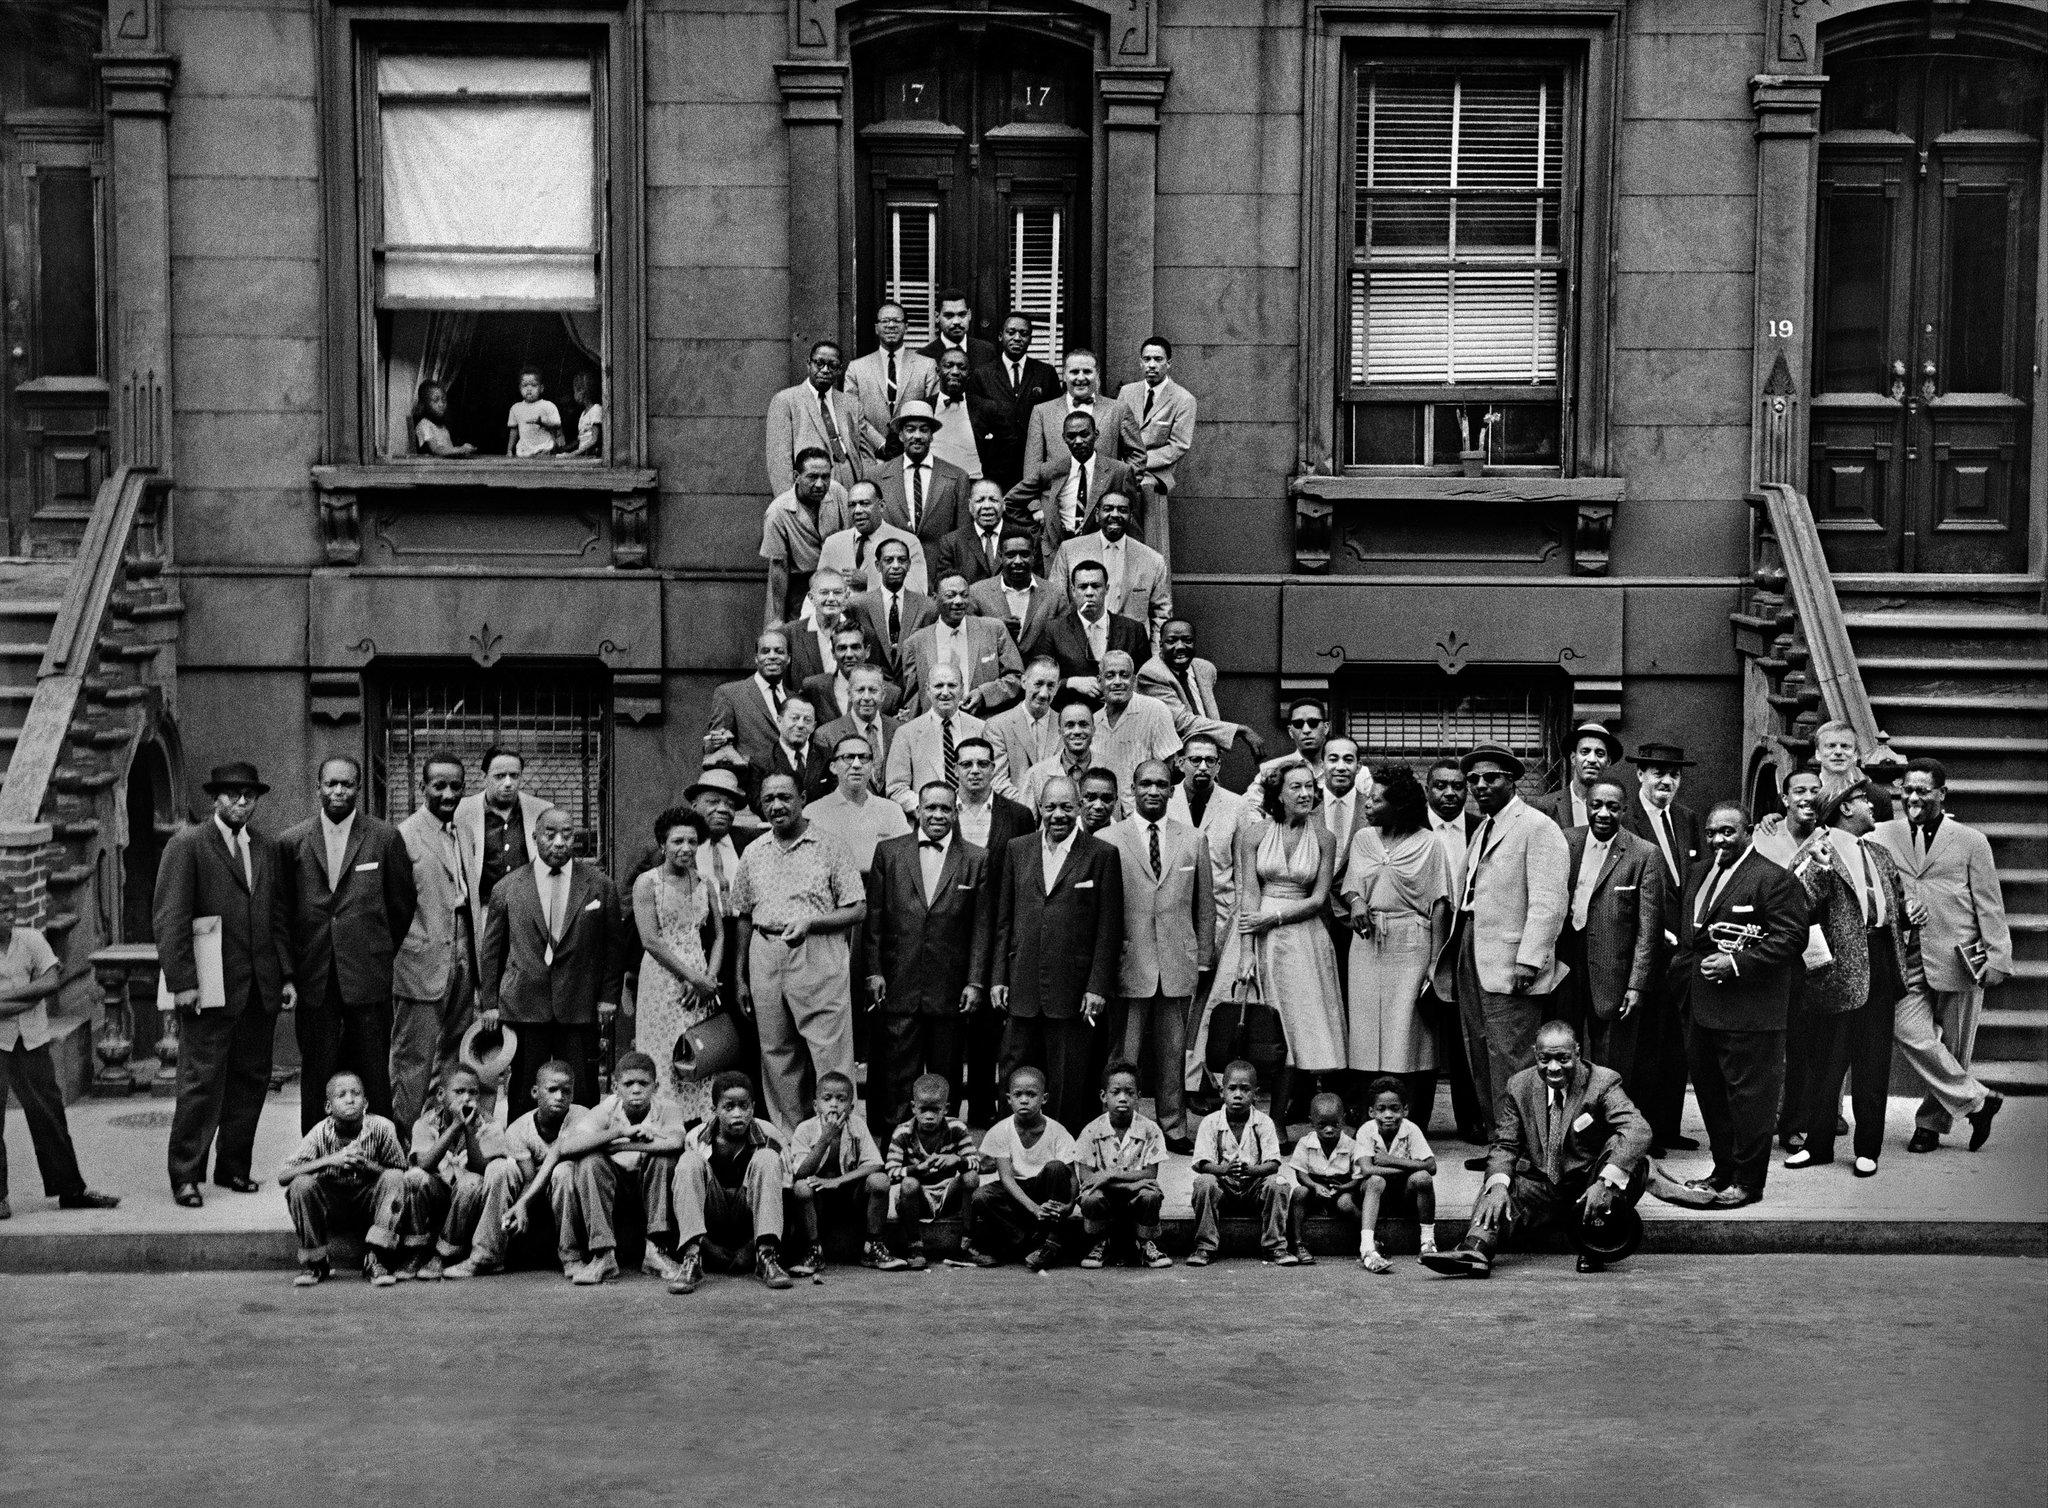 CANCELED: Upper East Harlem Block to be Co-Named After The Iconic Art Kane Photograph Harlem 1958